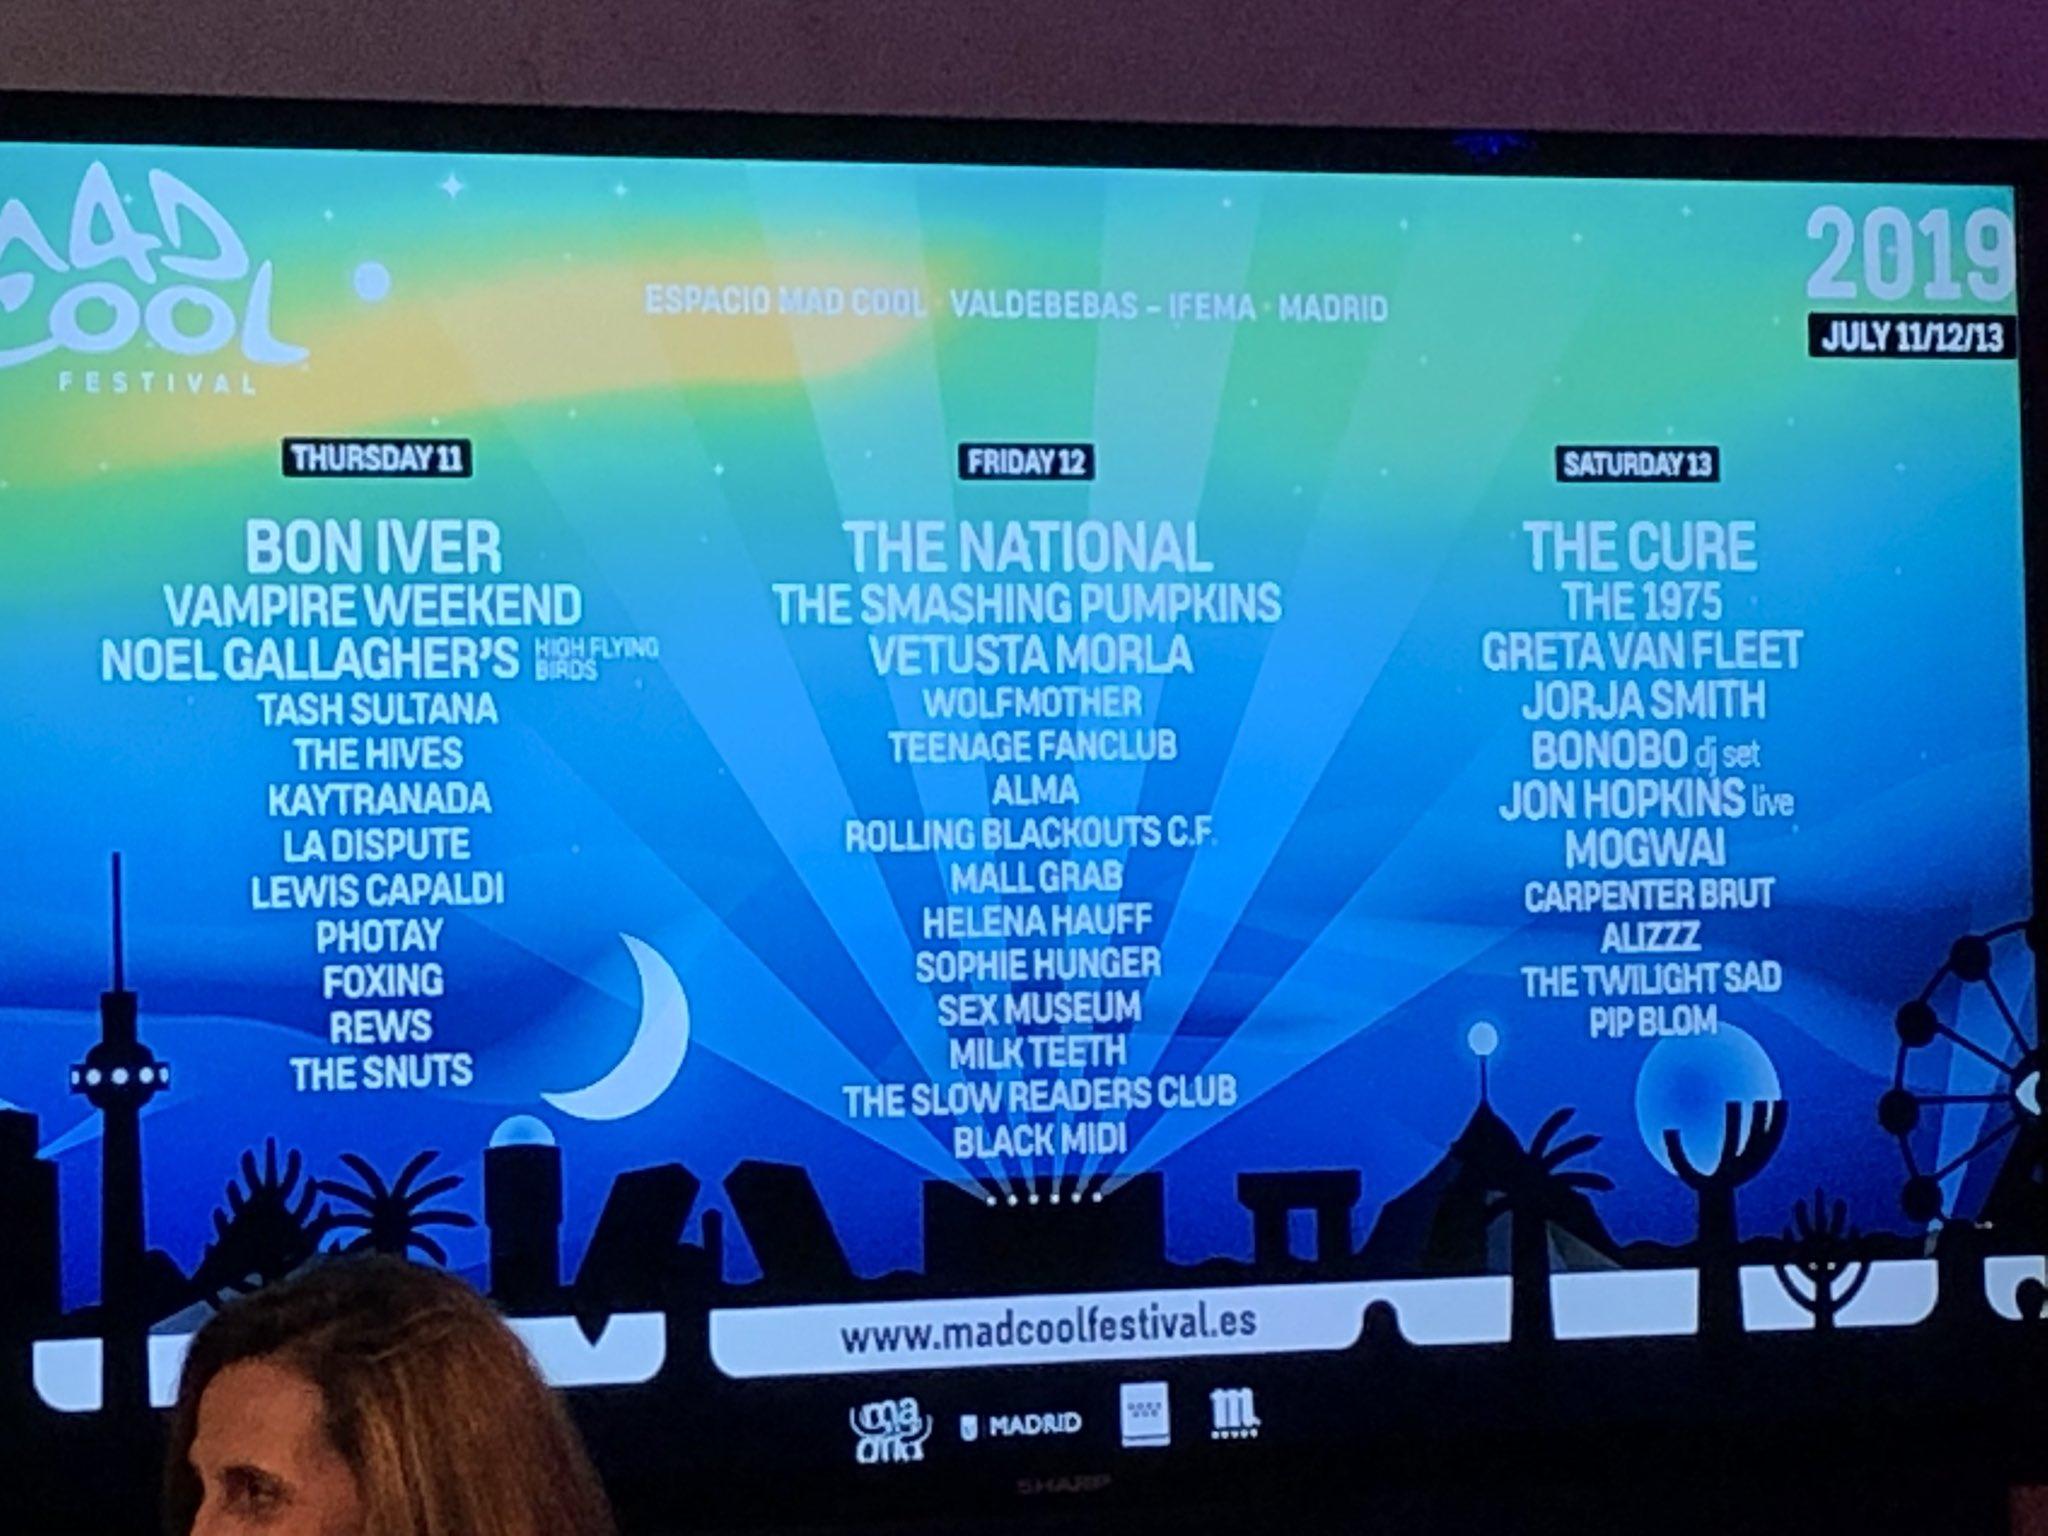 Mad Cool Festival 2019 / Smashing Pumpkins, Greta Van Fleet, Rolling Blackout, Twilight Sad y Sex Museum - Página 2 DtMbieuWkAI-SVv